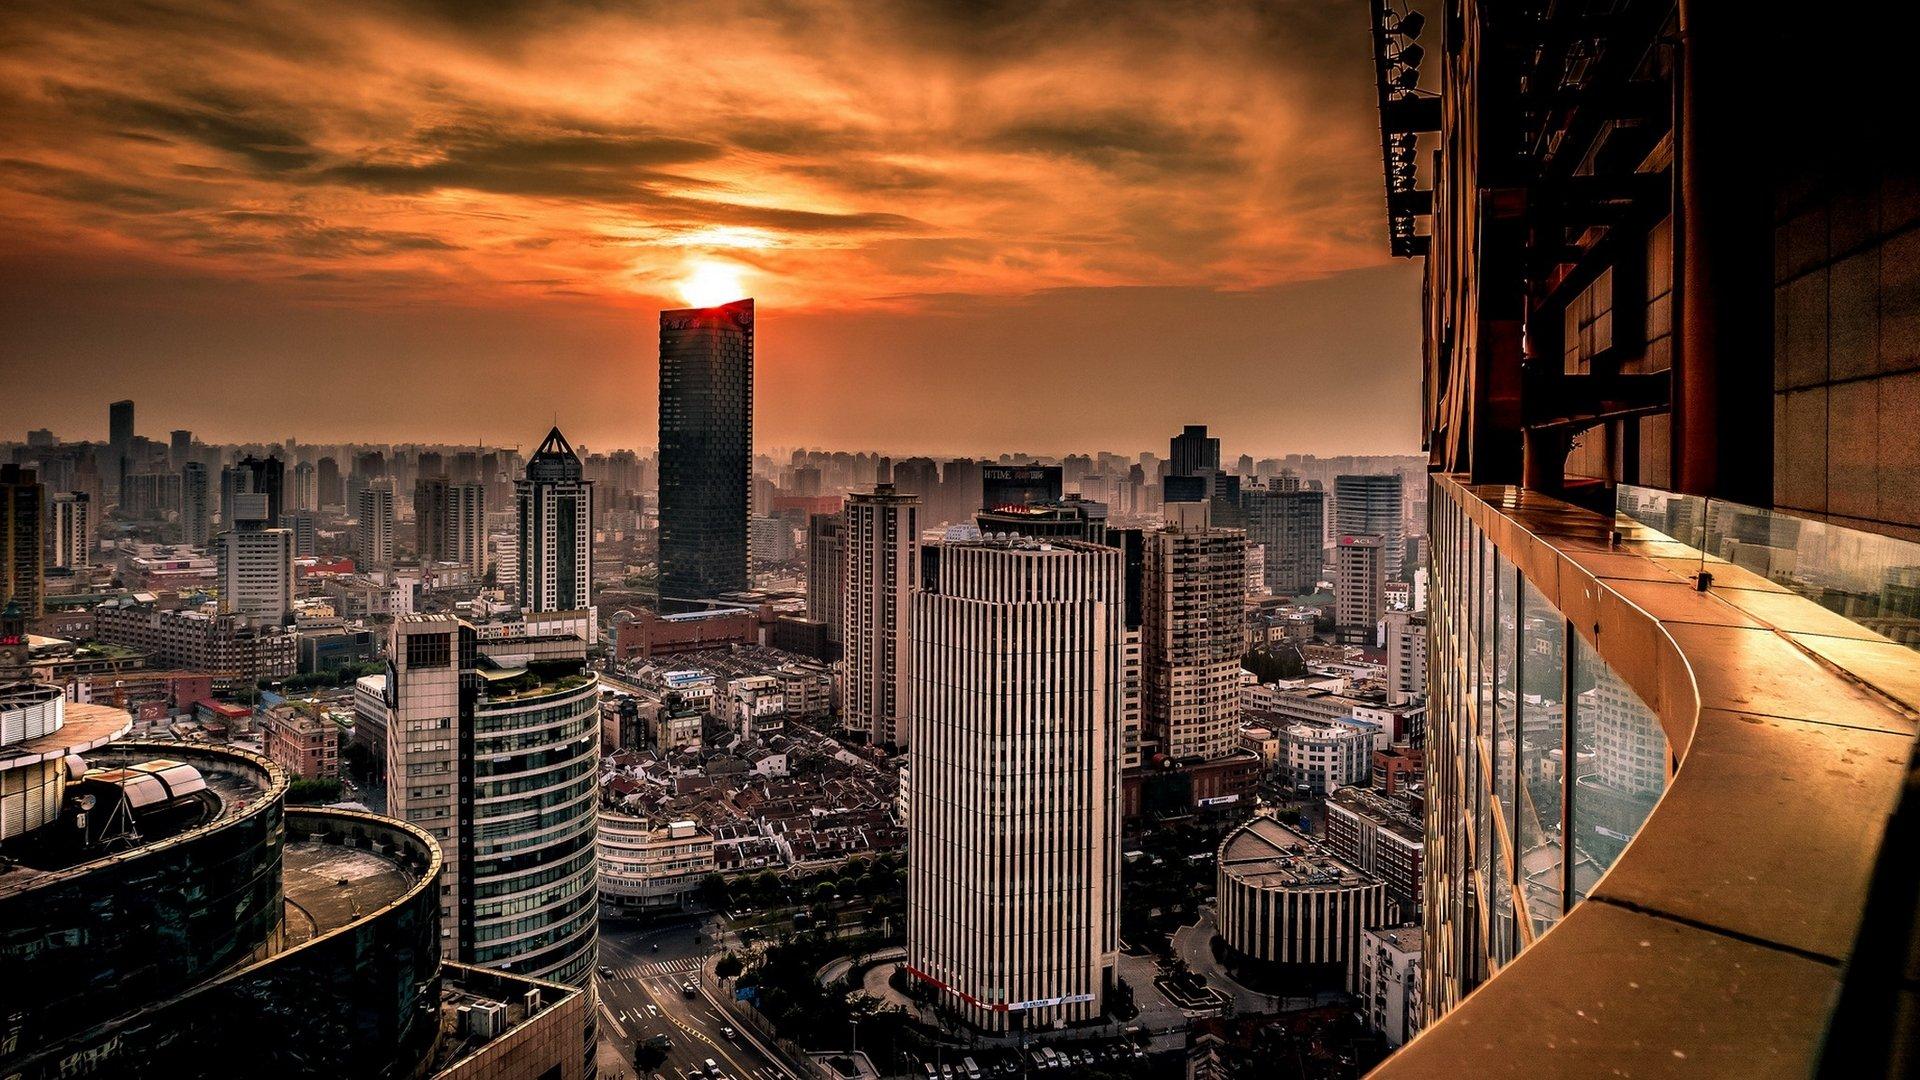 Awesome Shanghai Wallpaper